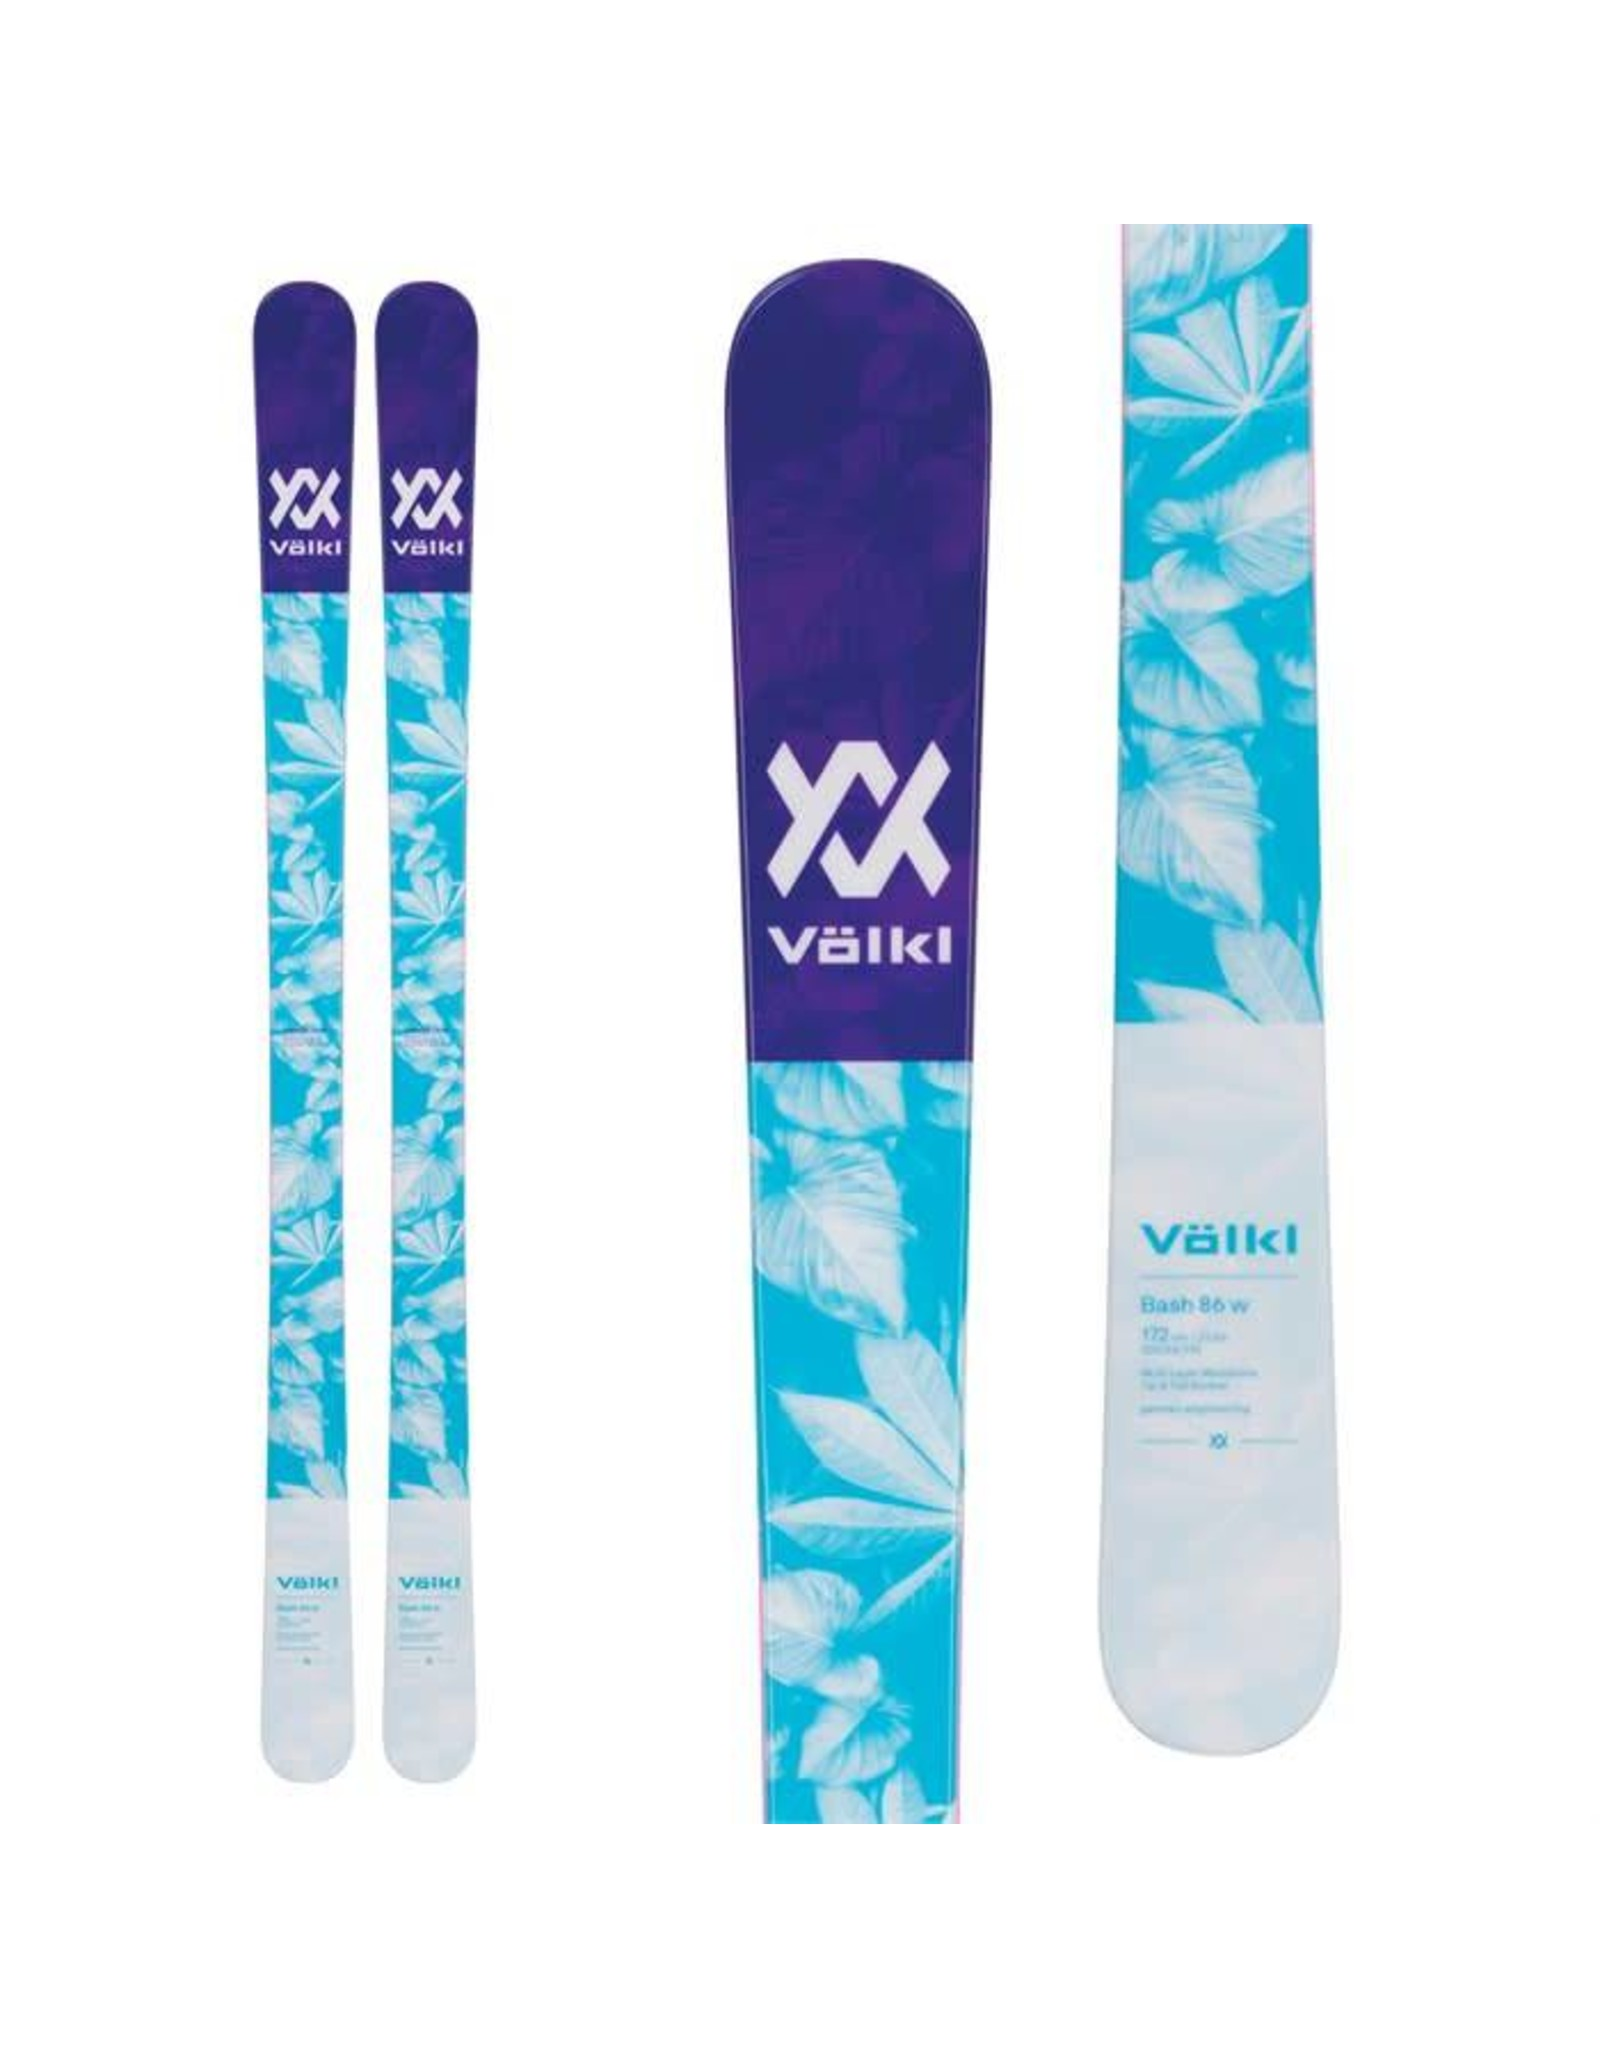 Völkl Volkl Bash 86 Women's Ski